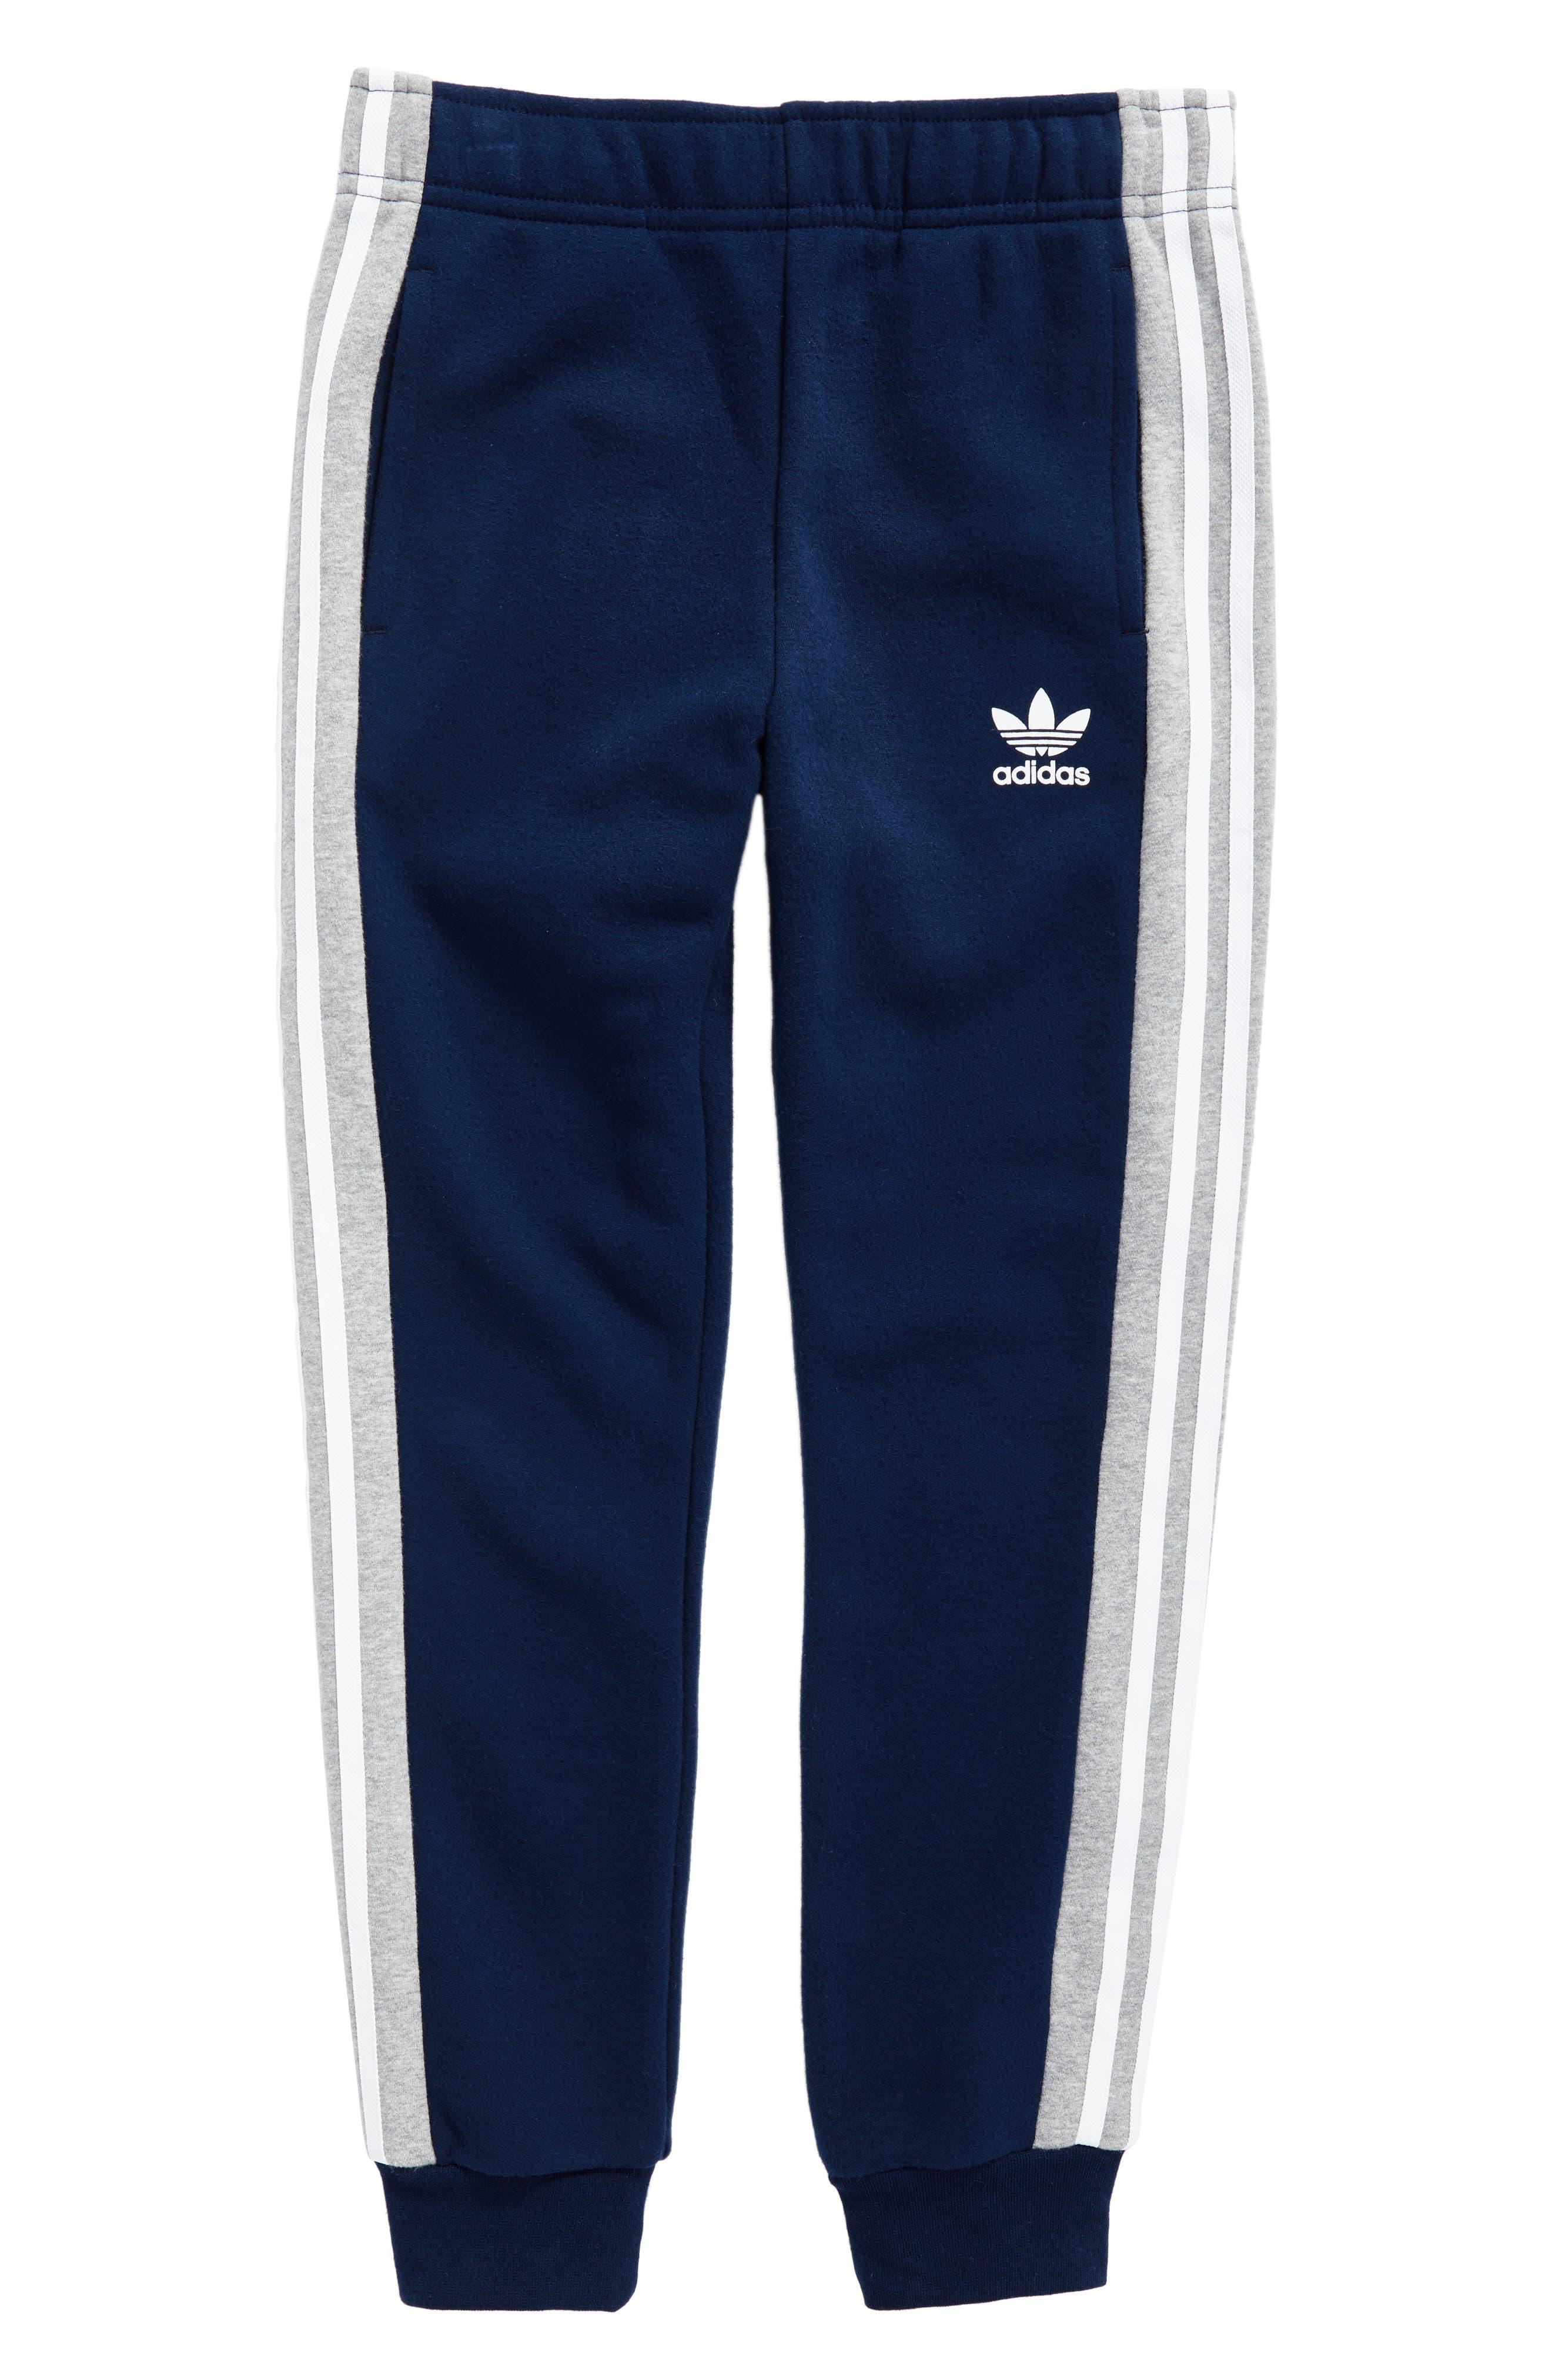 adidas FL Jogger Pants,                         Main,                         color, Collegiate Navy/ Medium Grey